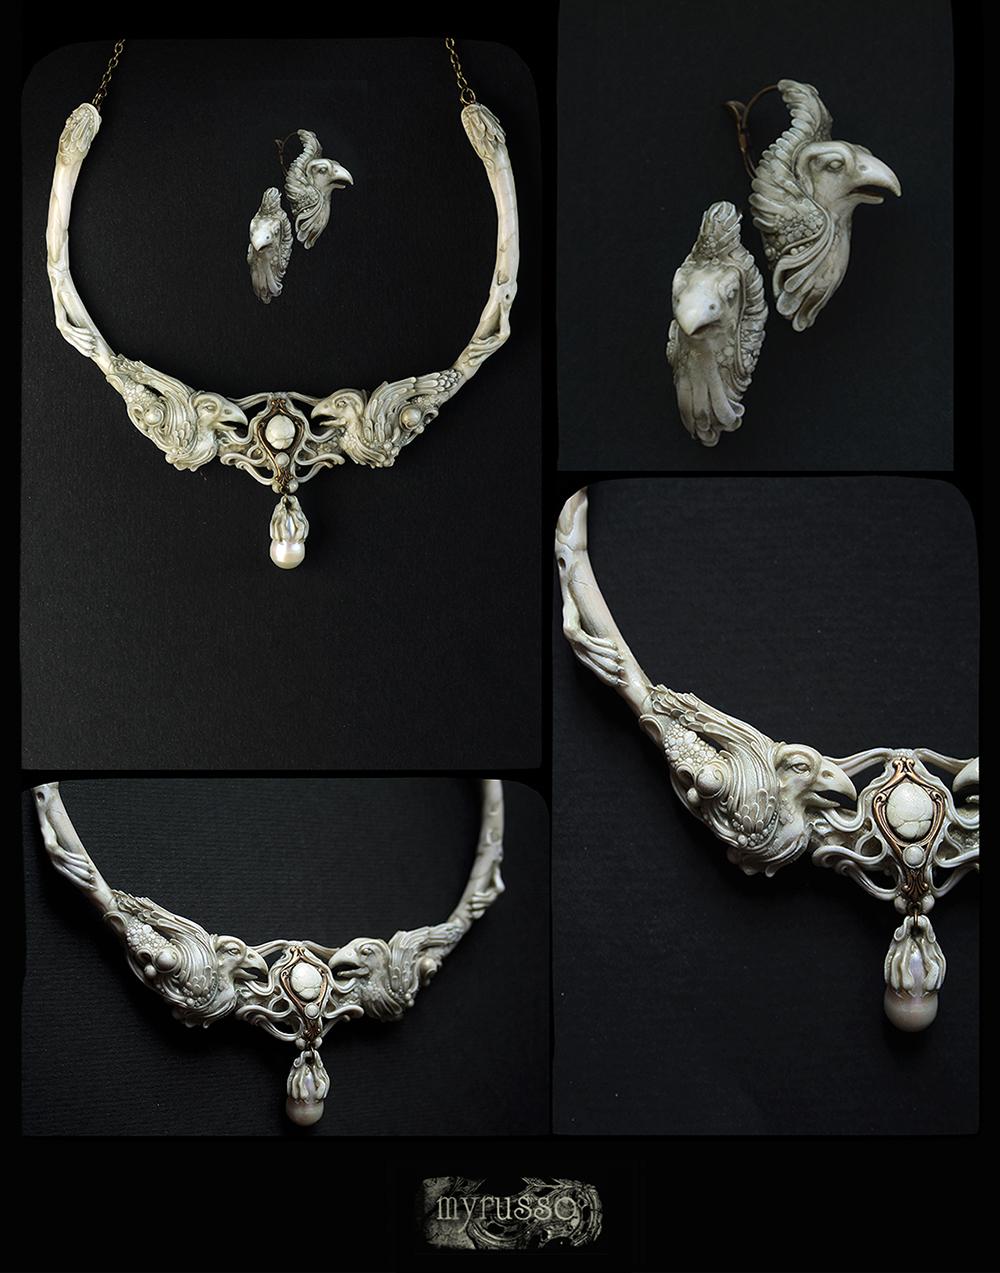 Marmor Greife by Myruso